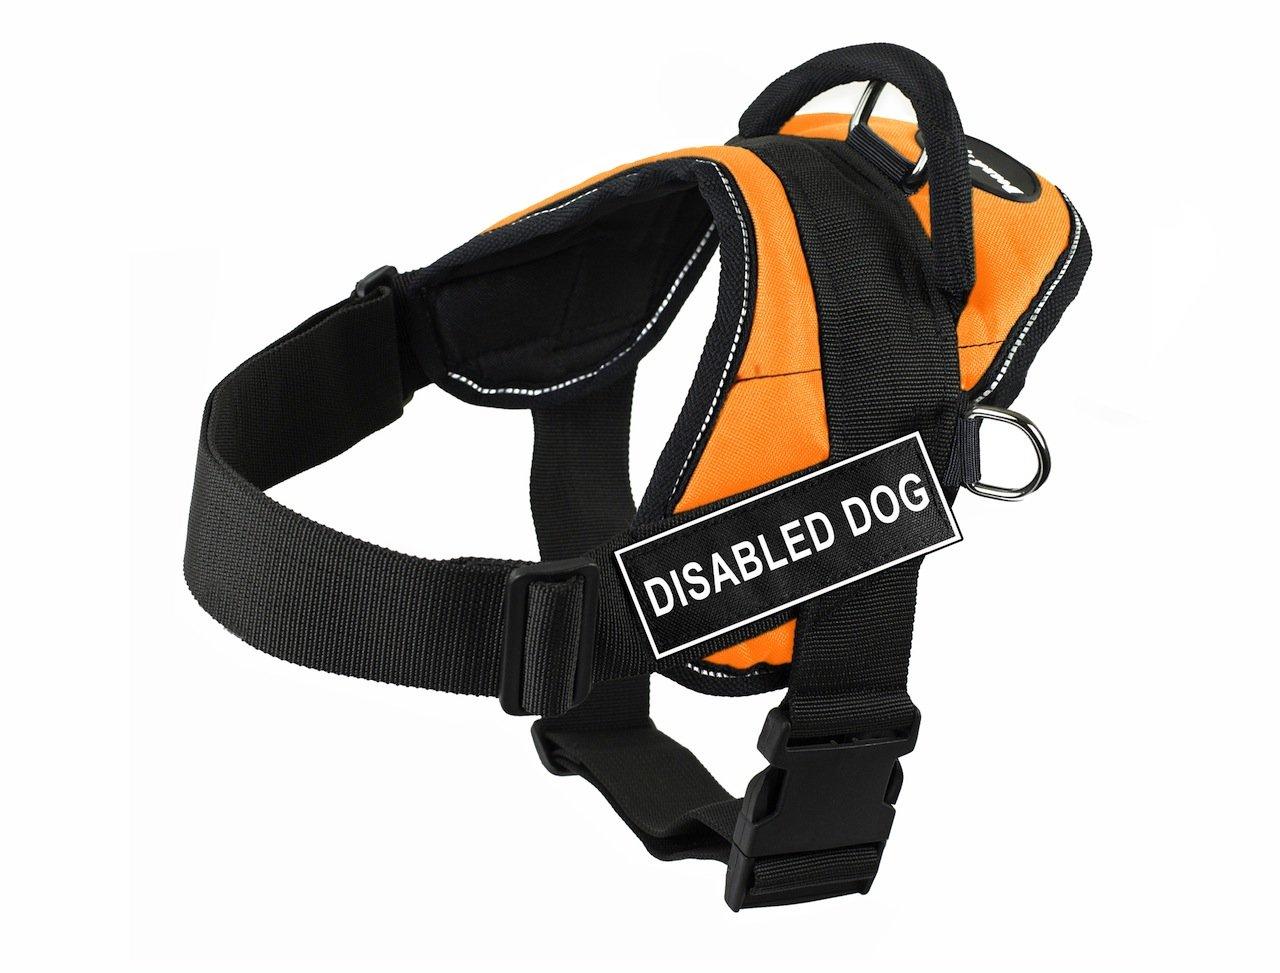 Dean & Tyler Fun disabili Cani Grande Arancione Imbracatura Imbracatura Imbracatura con Inserti Riflettenti. b58dba